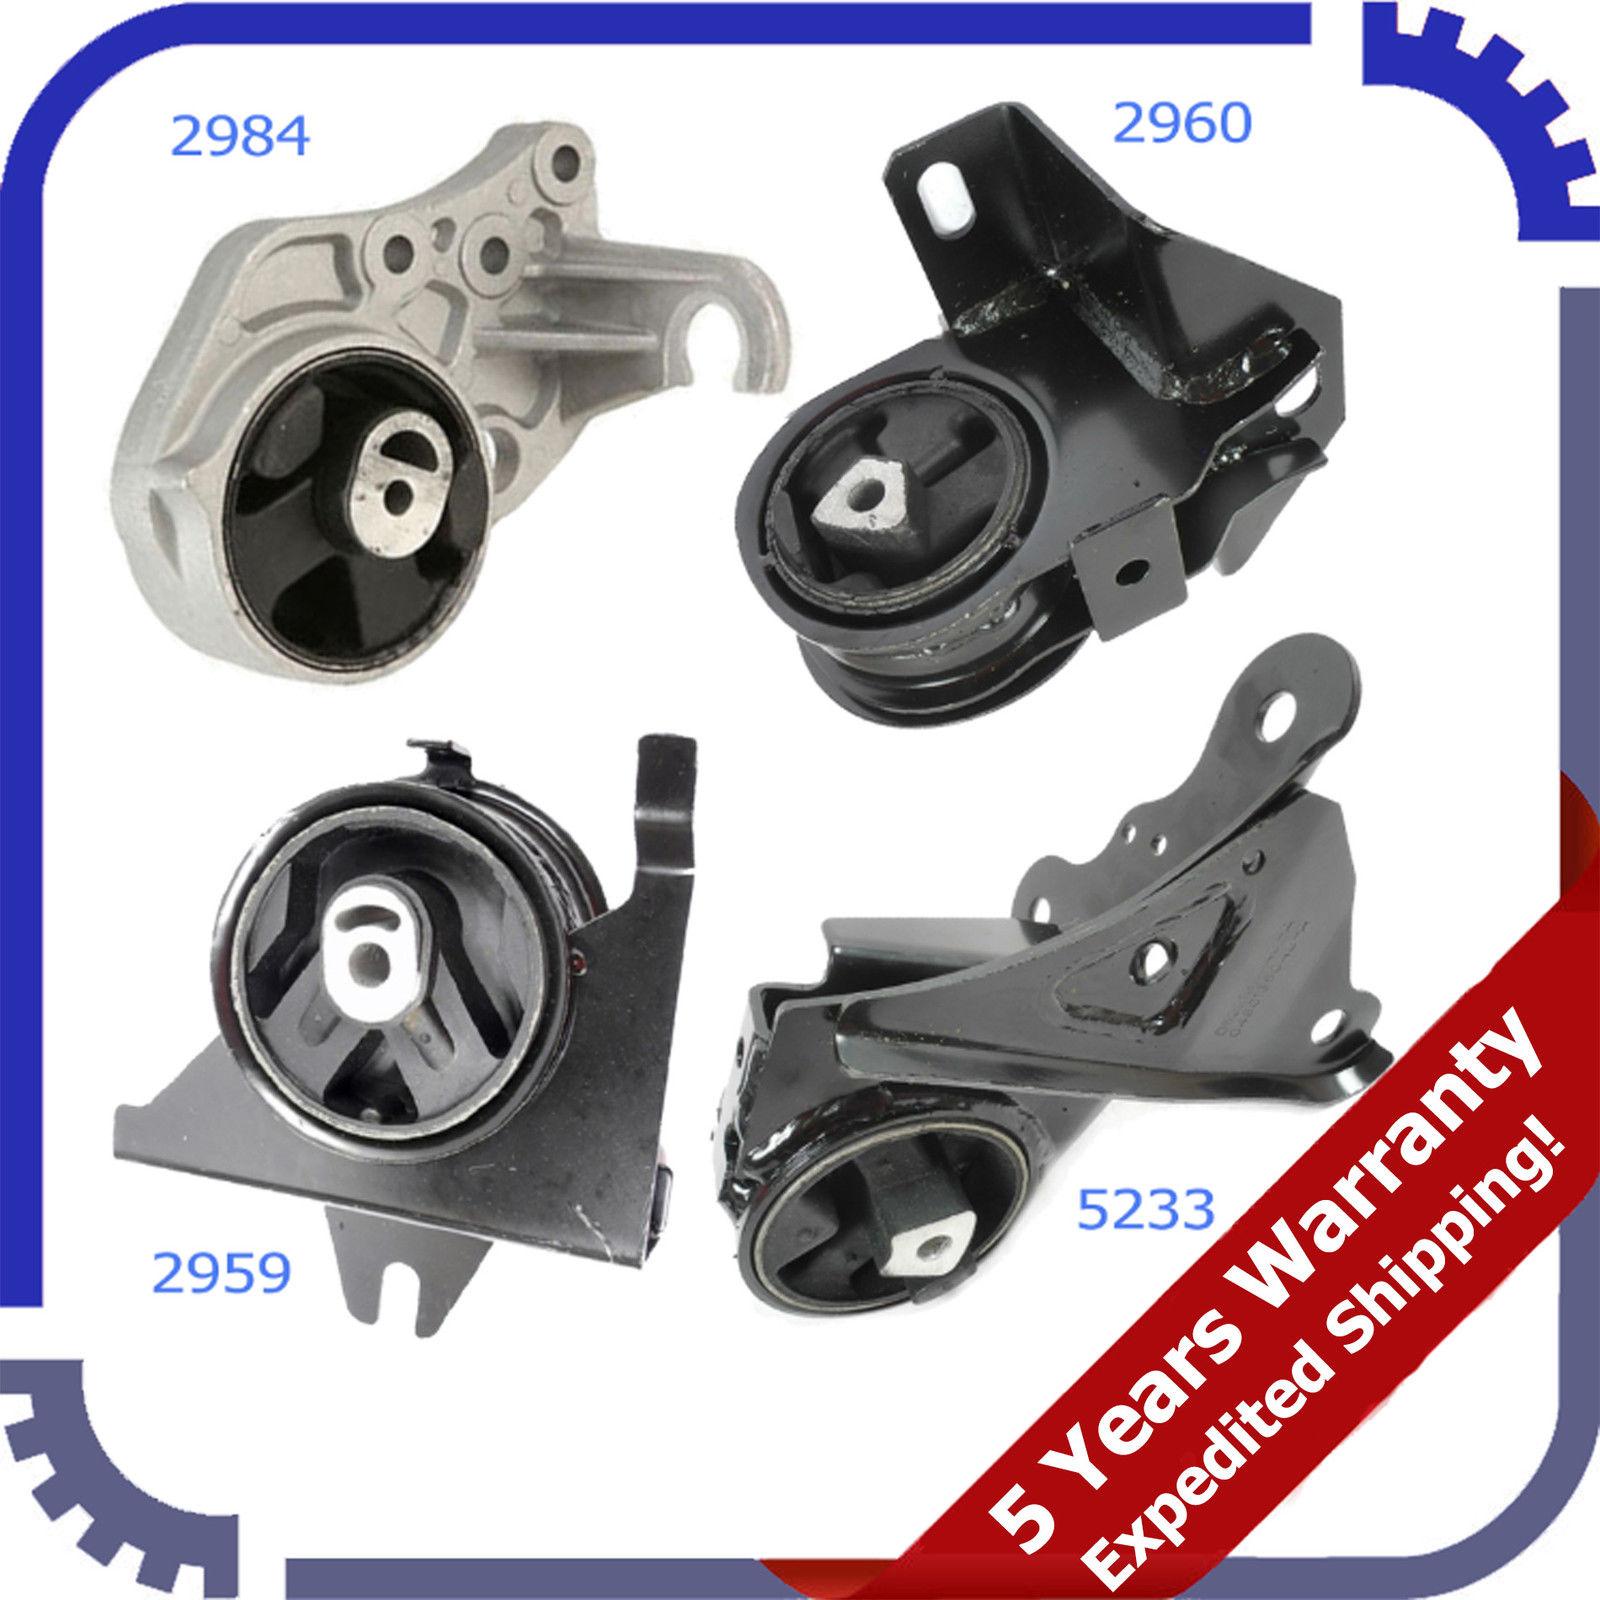 96-00 For Dodge Caravan 3.0L 3.3L 3.8L Engine Motor /& Trans Mount Set 4PCS M833